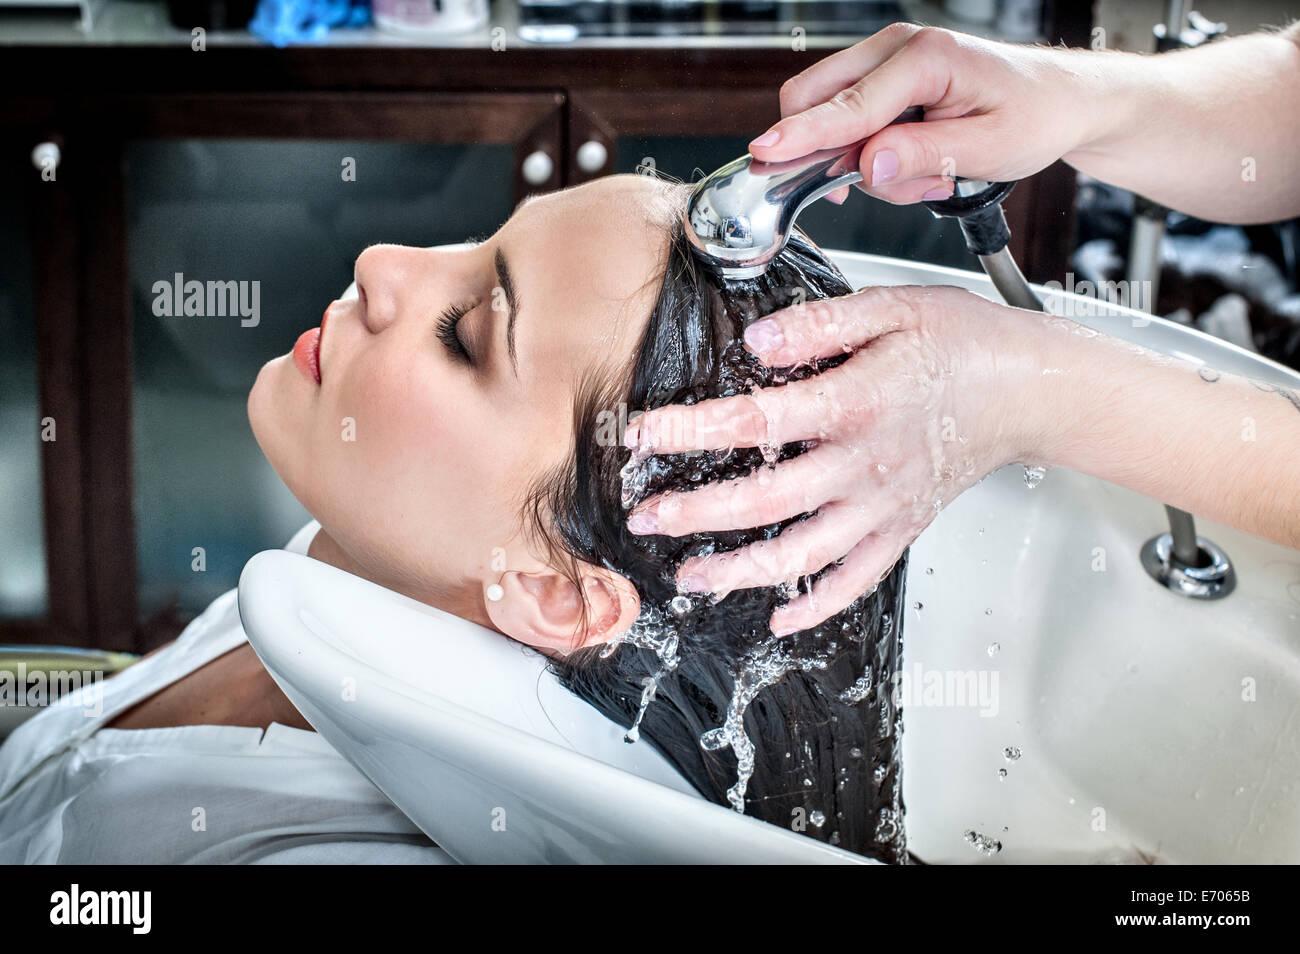 Weibliche Friseur spülen junge Frau an den Haaren in Friseursalon Stockbild